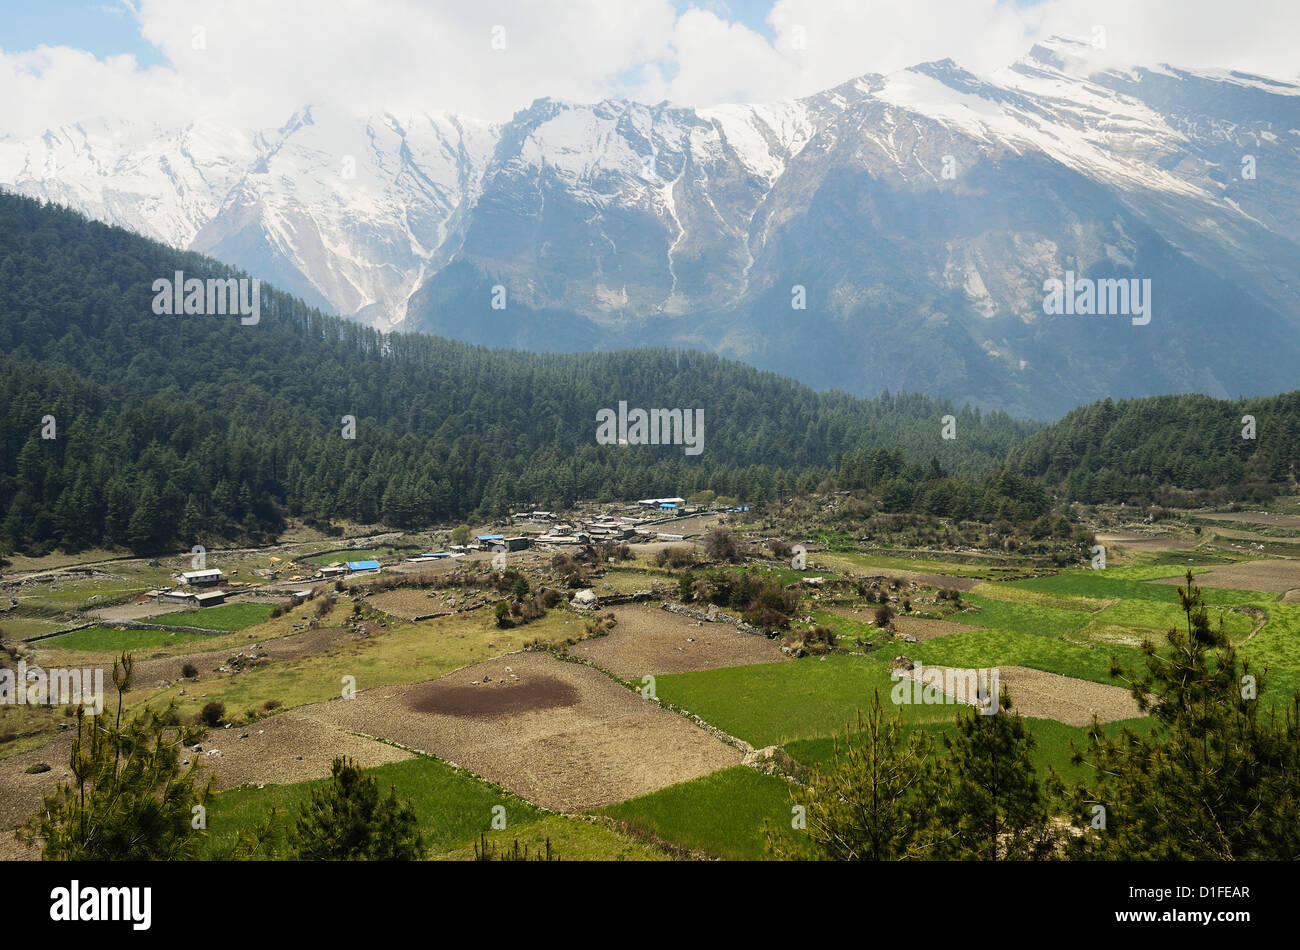 Dhaulagiri Himal seen from Titi, Annapurna Conservation Area, Dhawalagiri (Dhaulagiri), Western Region (Pashchimanchal), - Stock Image